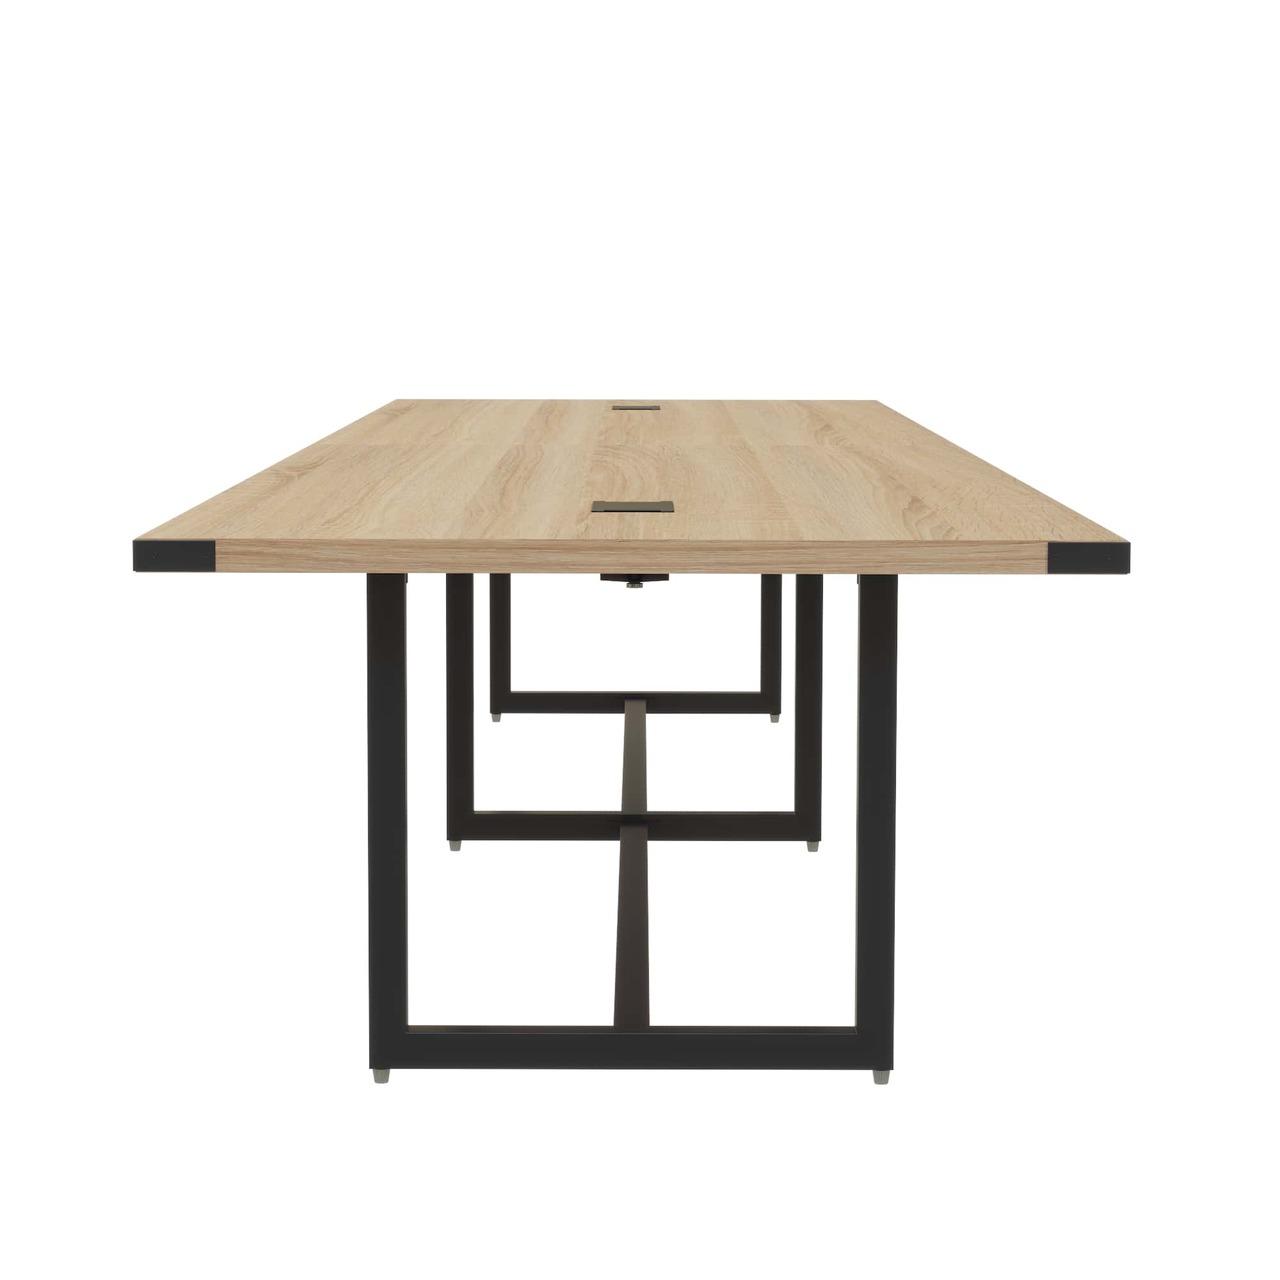 mrs16 mirella table end view